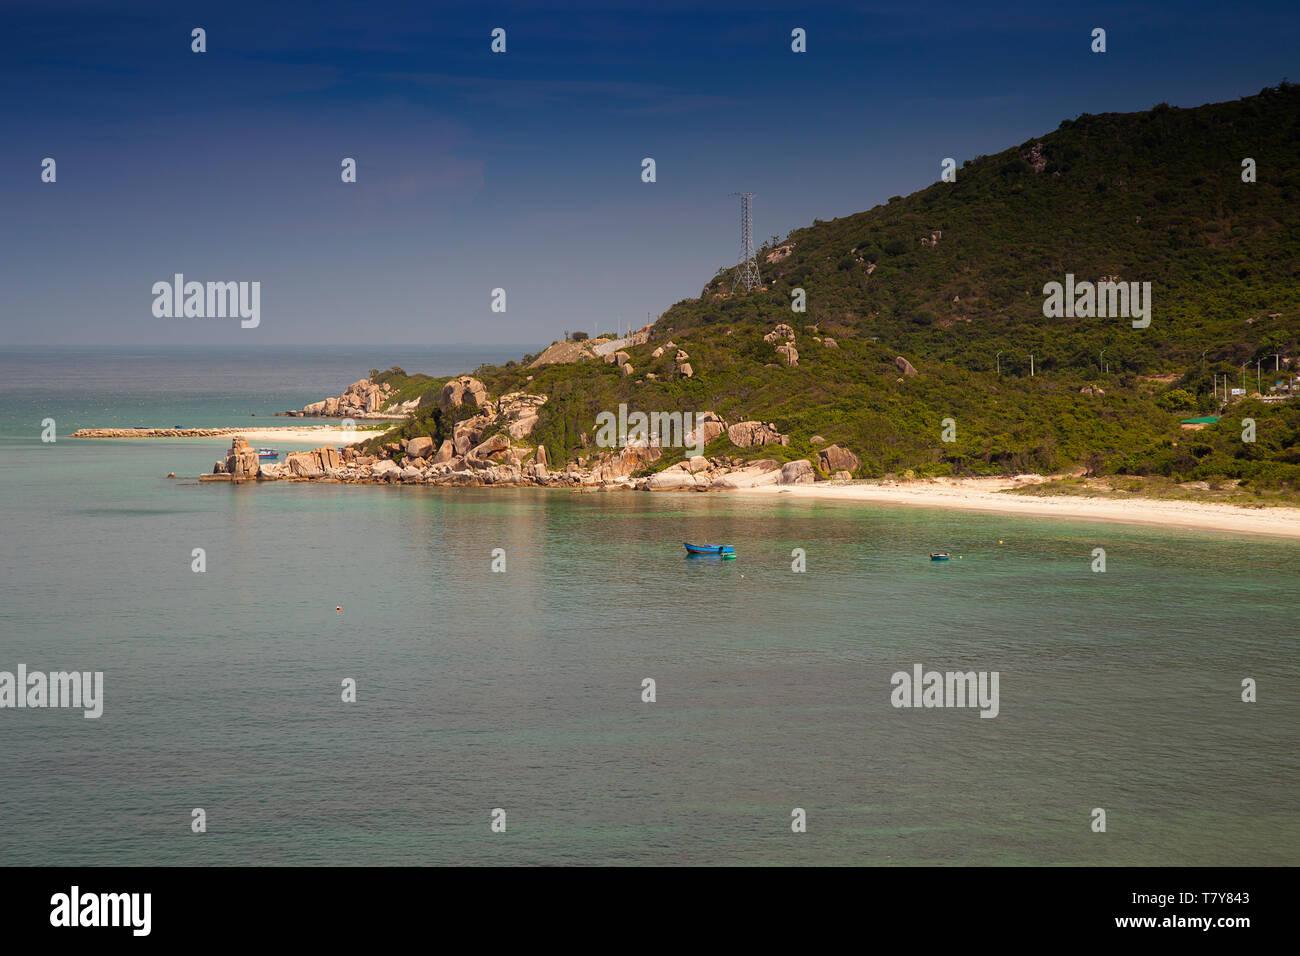 Rocky coast landscape at Vinh Hy, South China Sea,Ninh Thuan, Vietnam,asia - Stock Image